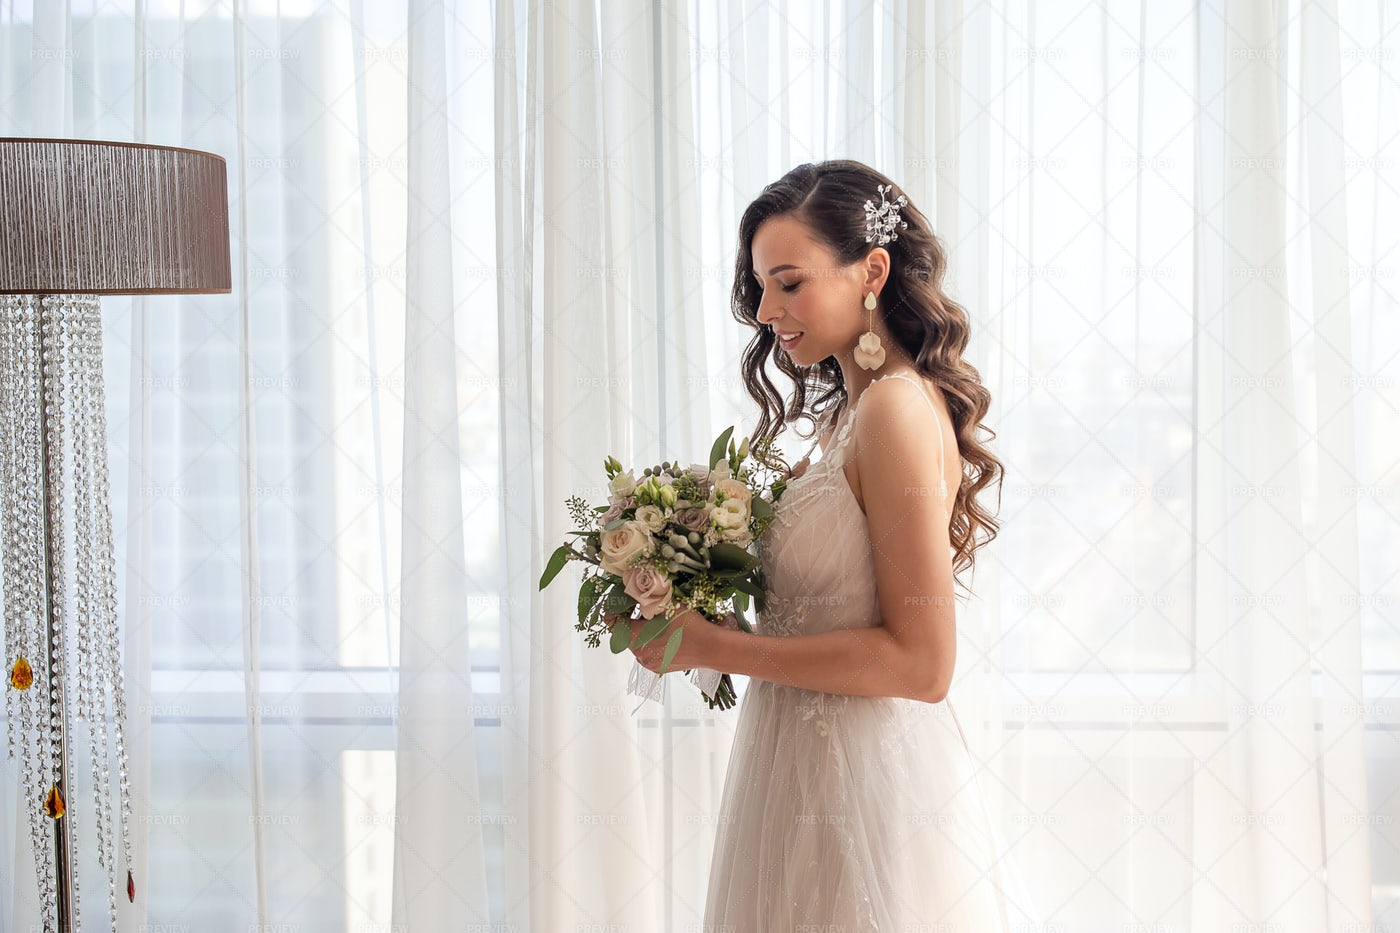 Bride With Bouquet: Stock Photos